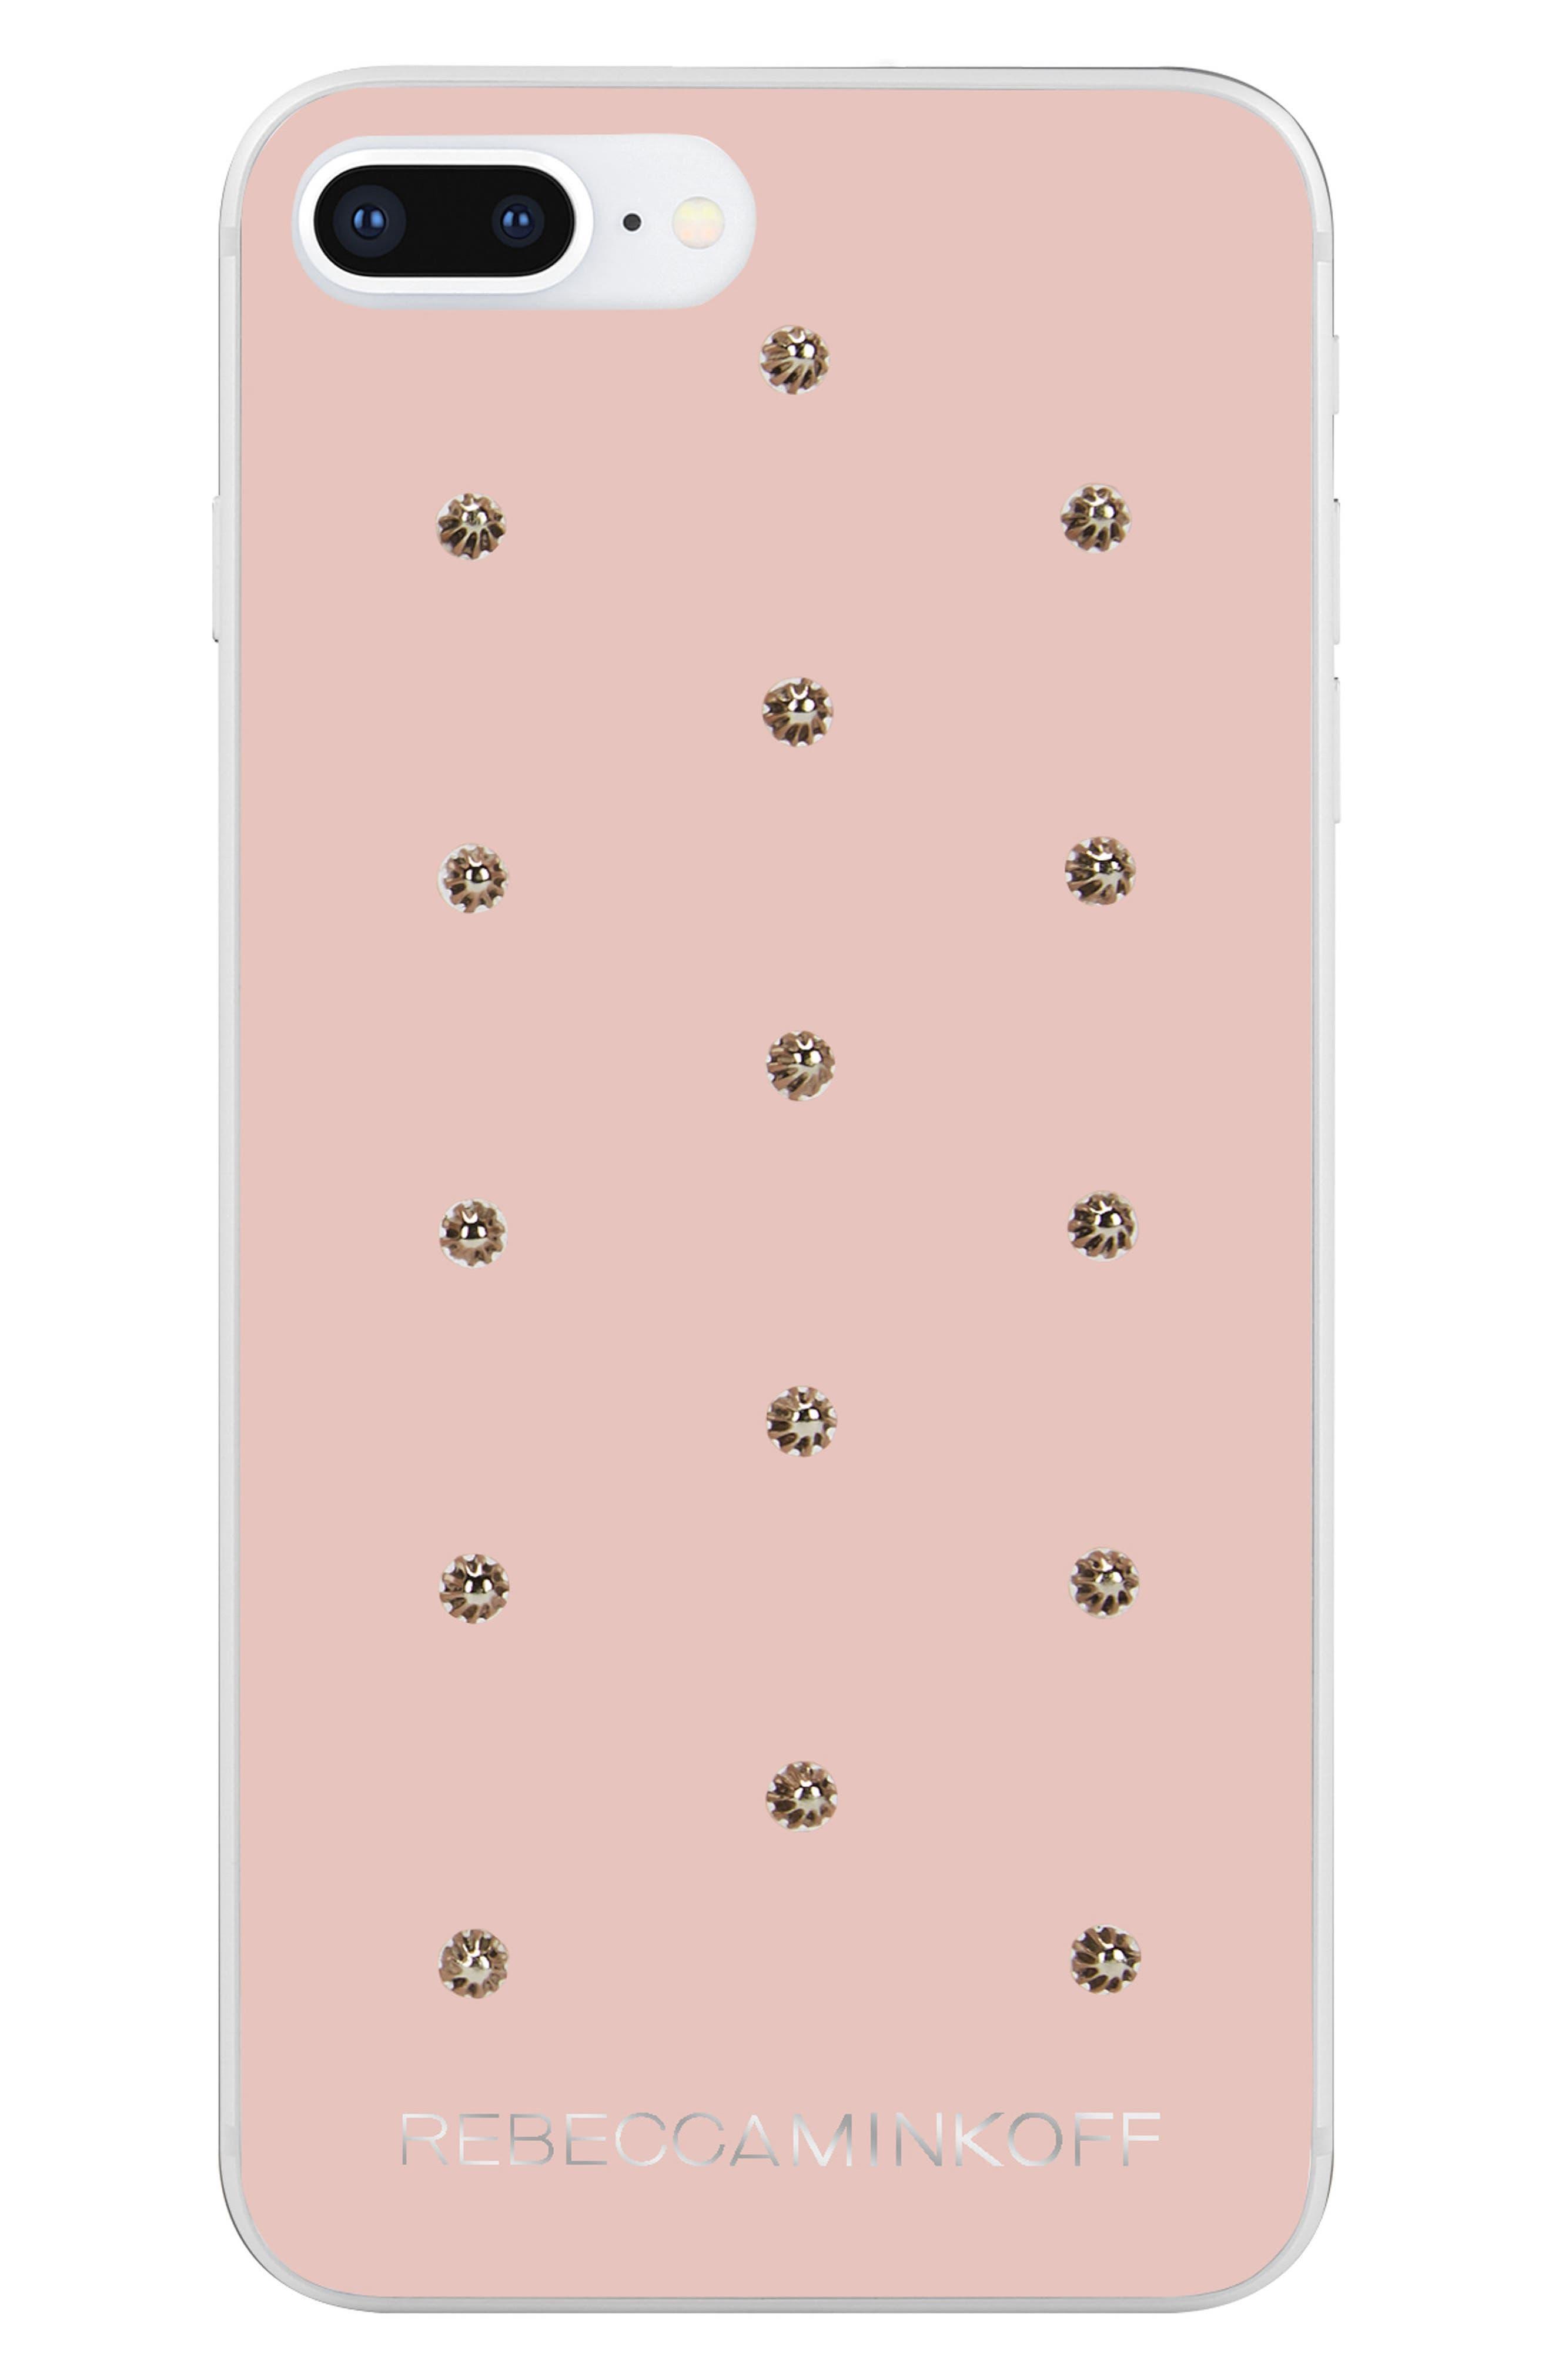 Flower Stud iPhone 7/8 & 7/8 Plus Case,                             Main thumbnail 1, color,                             ROSE GOLD/ GOLD STUDS